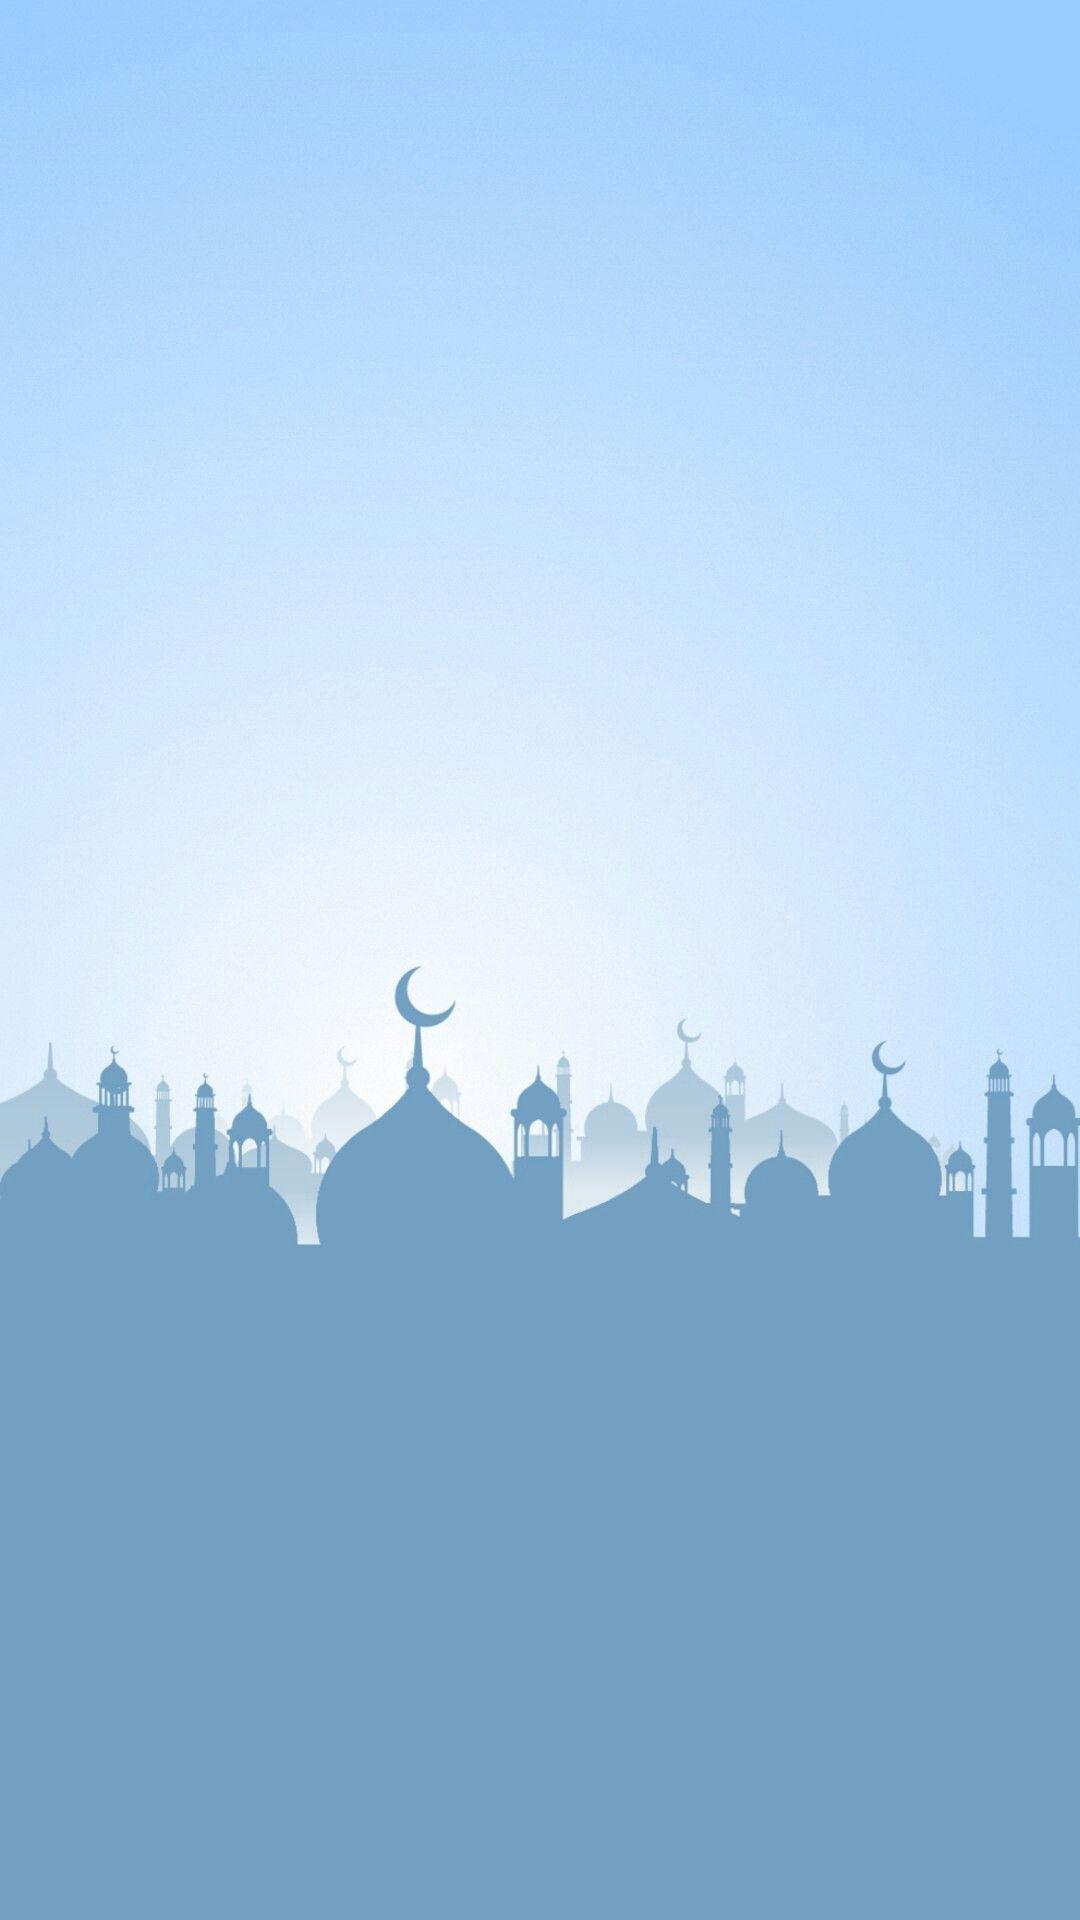 Background Abstrak Islami : background, abstrak, islami, Yannuar, Ilham, Material, °Minimal, °Pattern, Latar, Belakang,, Fotografi, Abstrak,, Abstrak